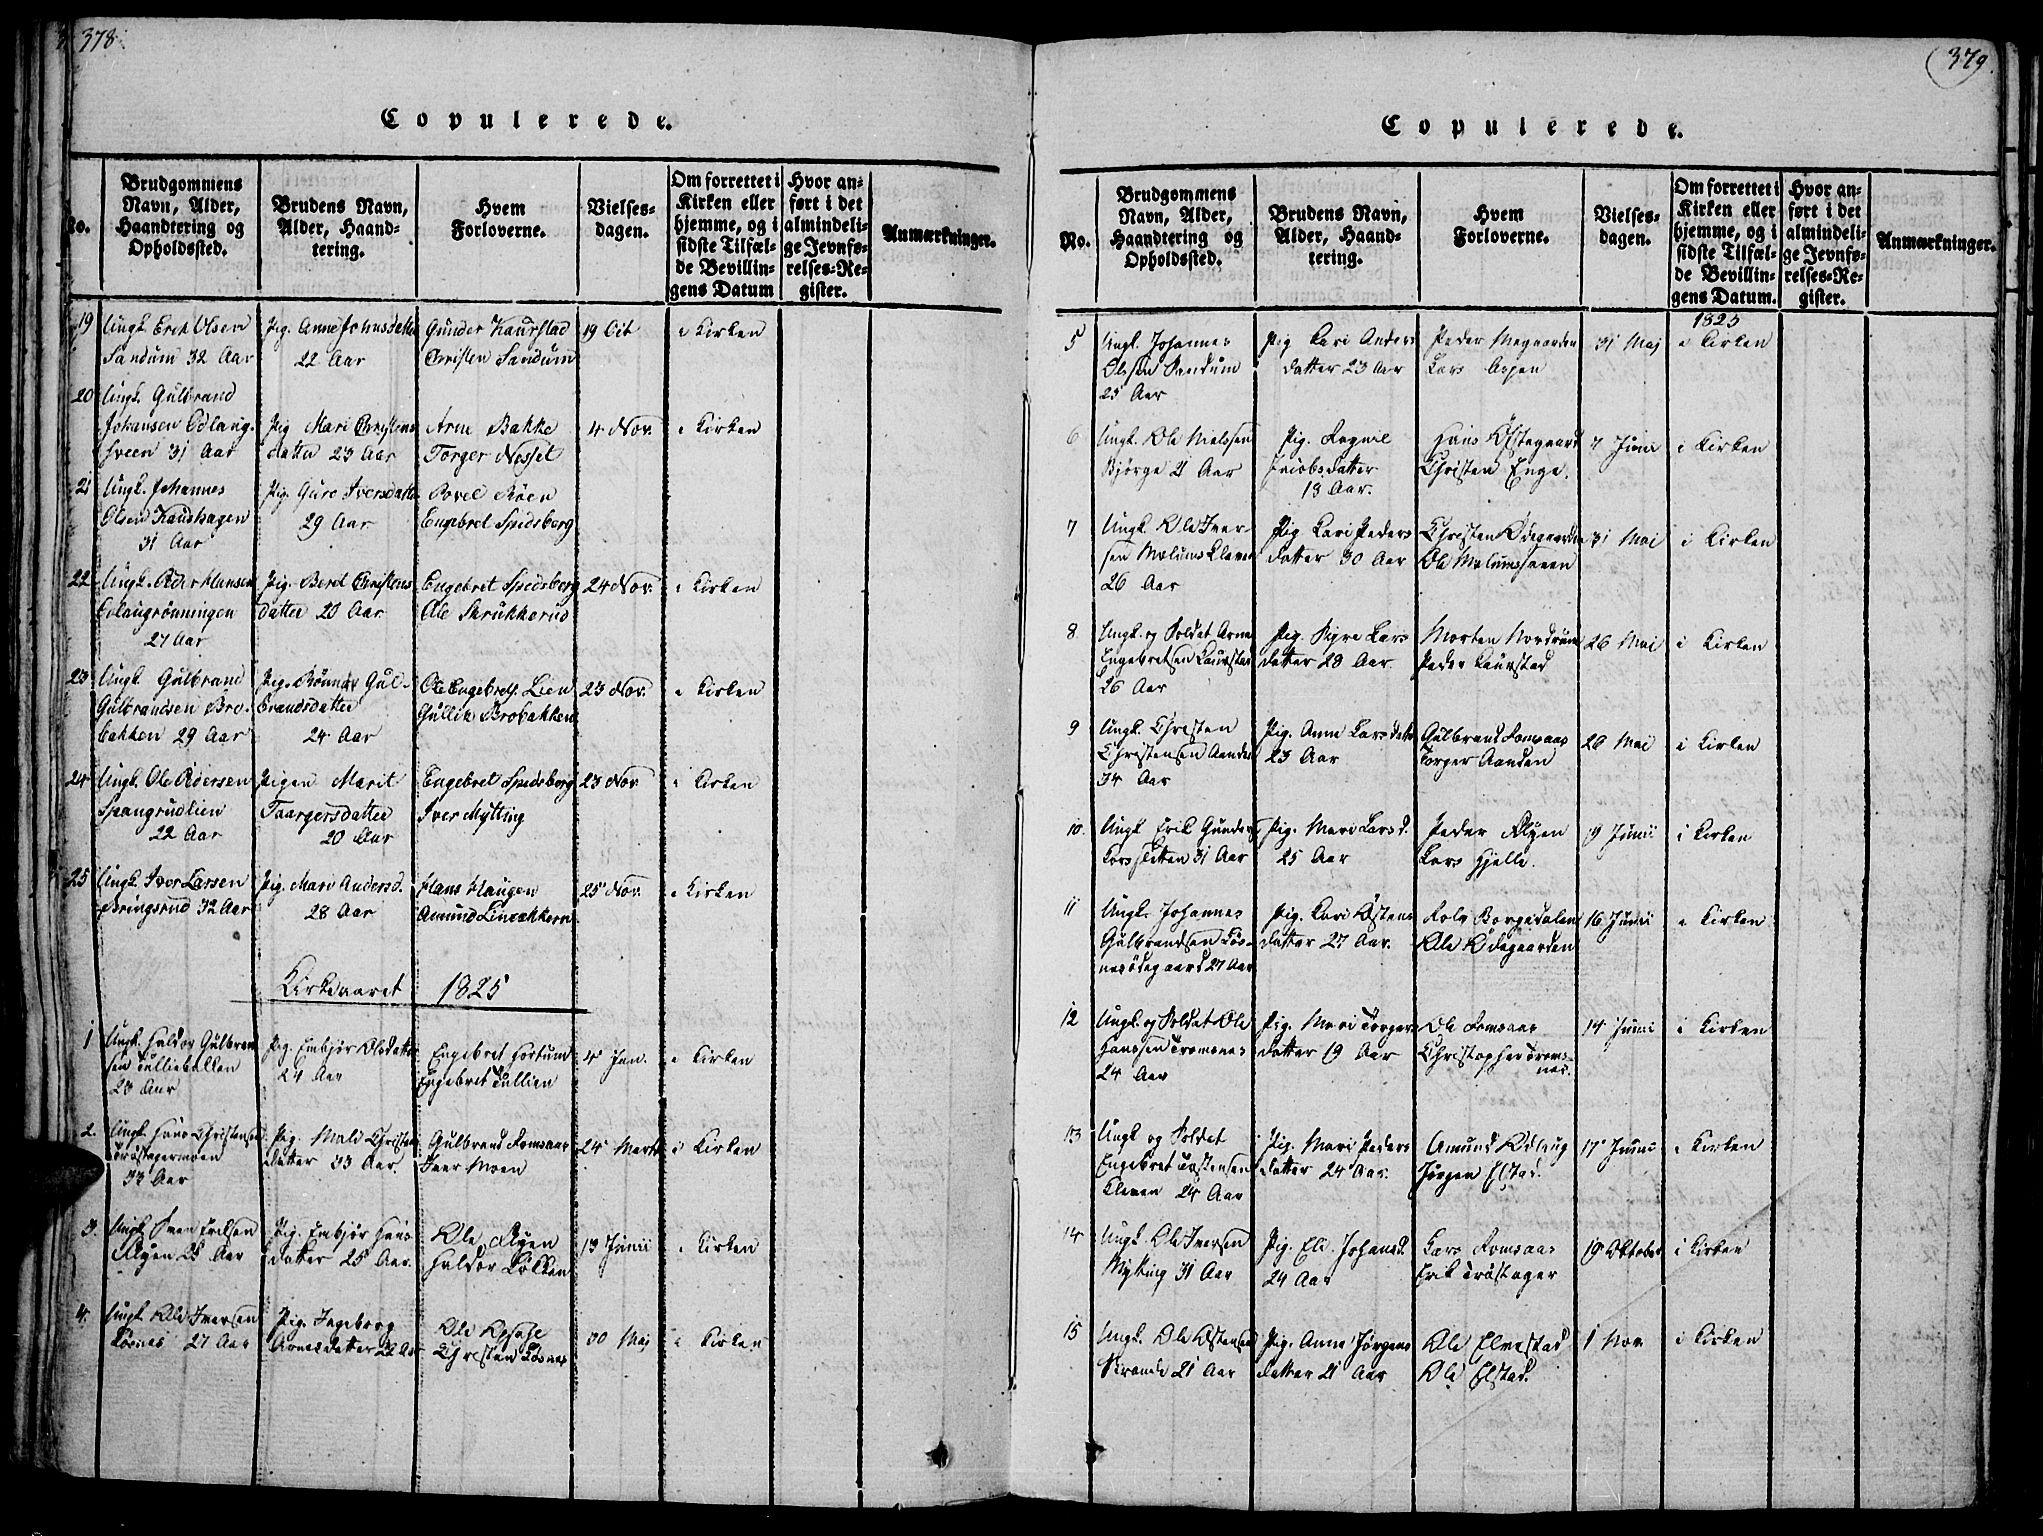 SAH, Ringebu prestekontor, Ministerialbok nr. 4, 1821-1839, s. 378-379